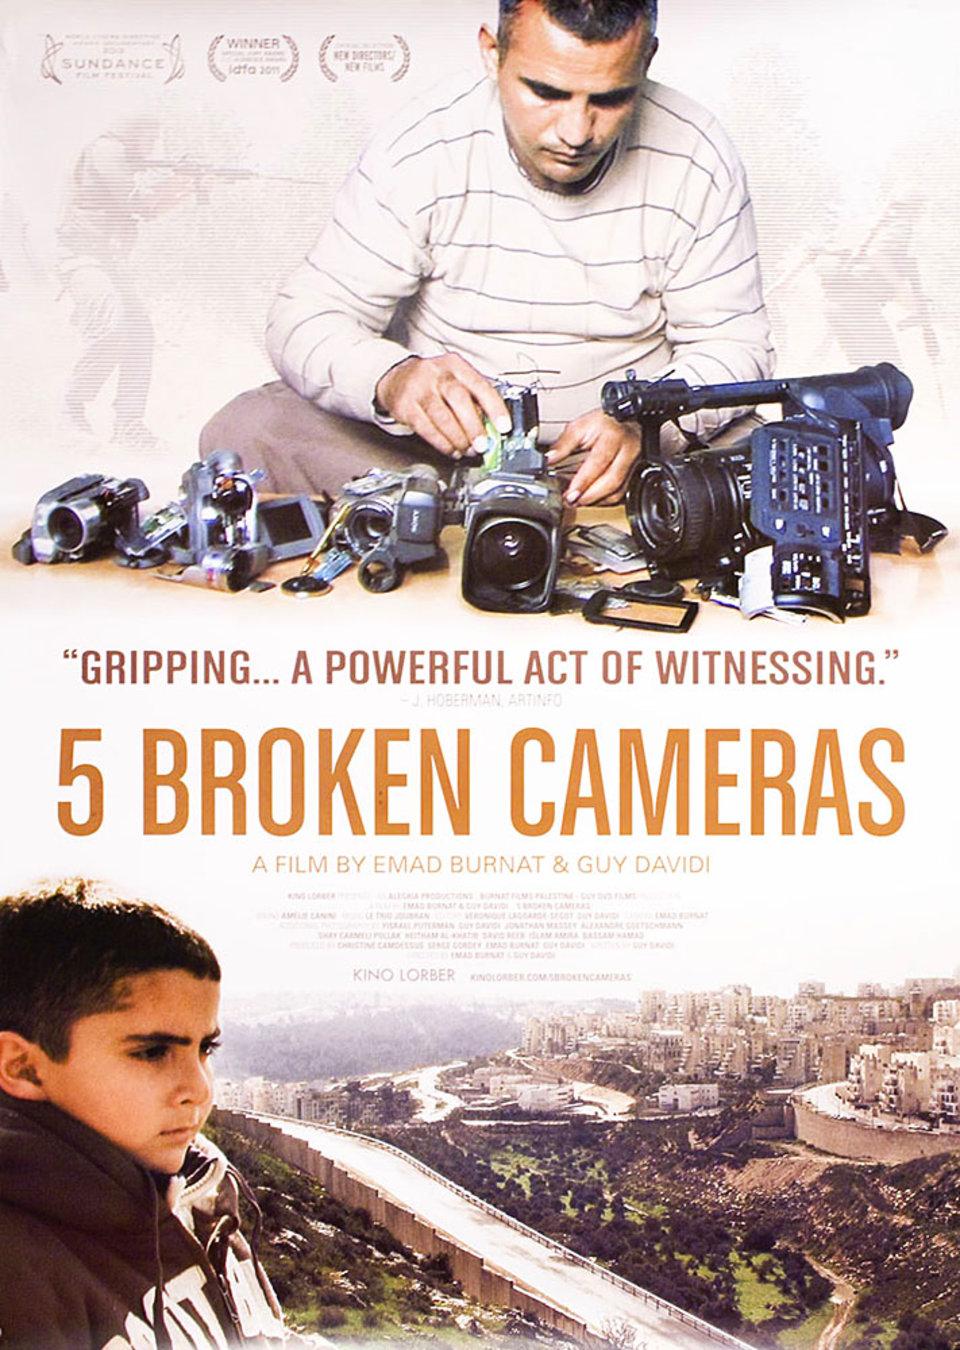 5 Broken Cameras 2011 U.S. One Sheet Poster